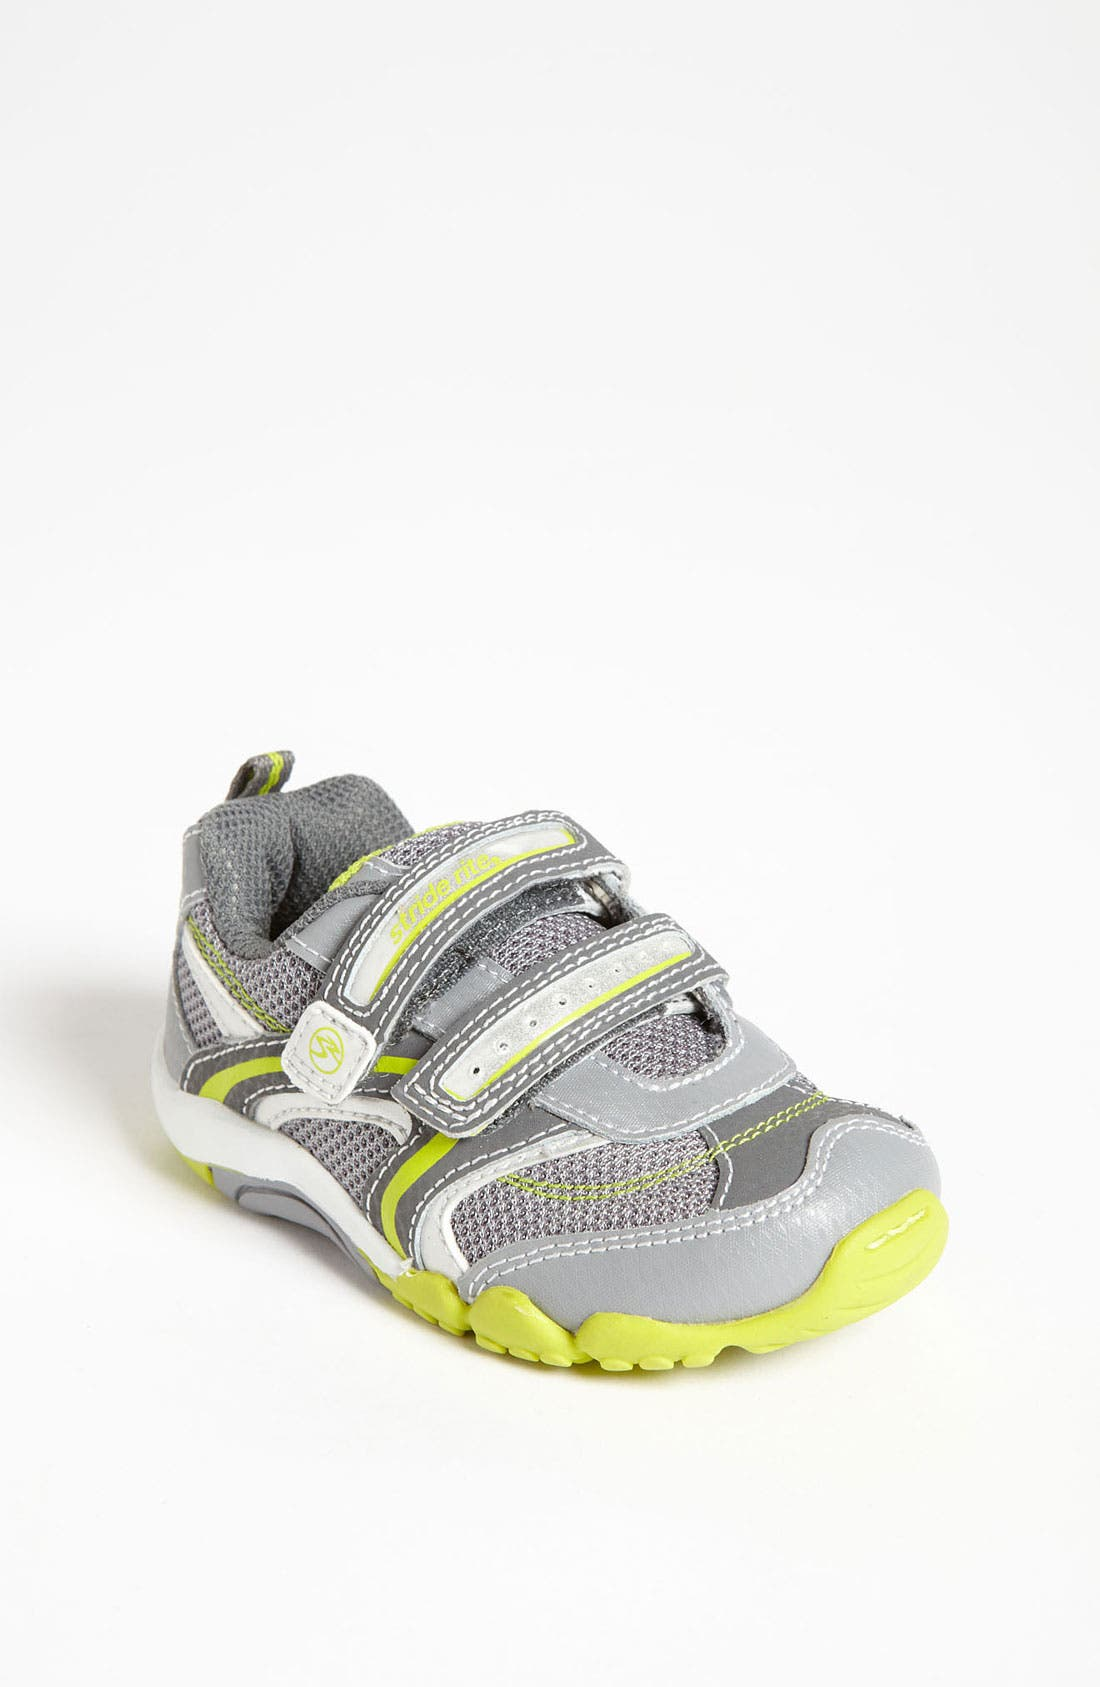 Alternate Image 1 Selected - Stride Rite 'Falcon' Sneaker (Baby, Walker & Toddler)